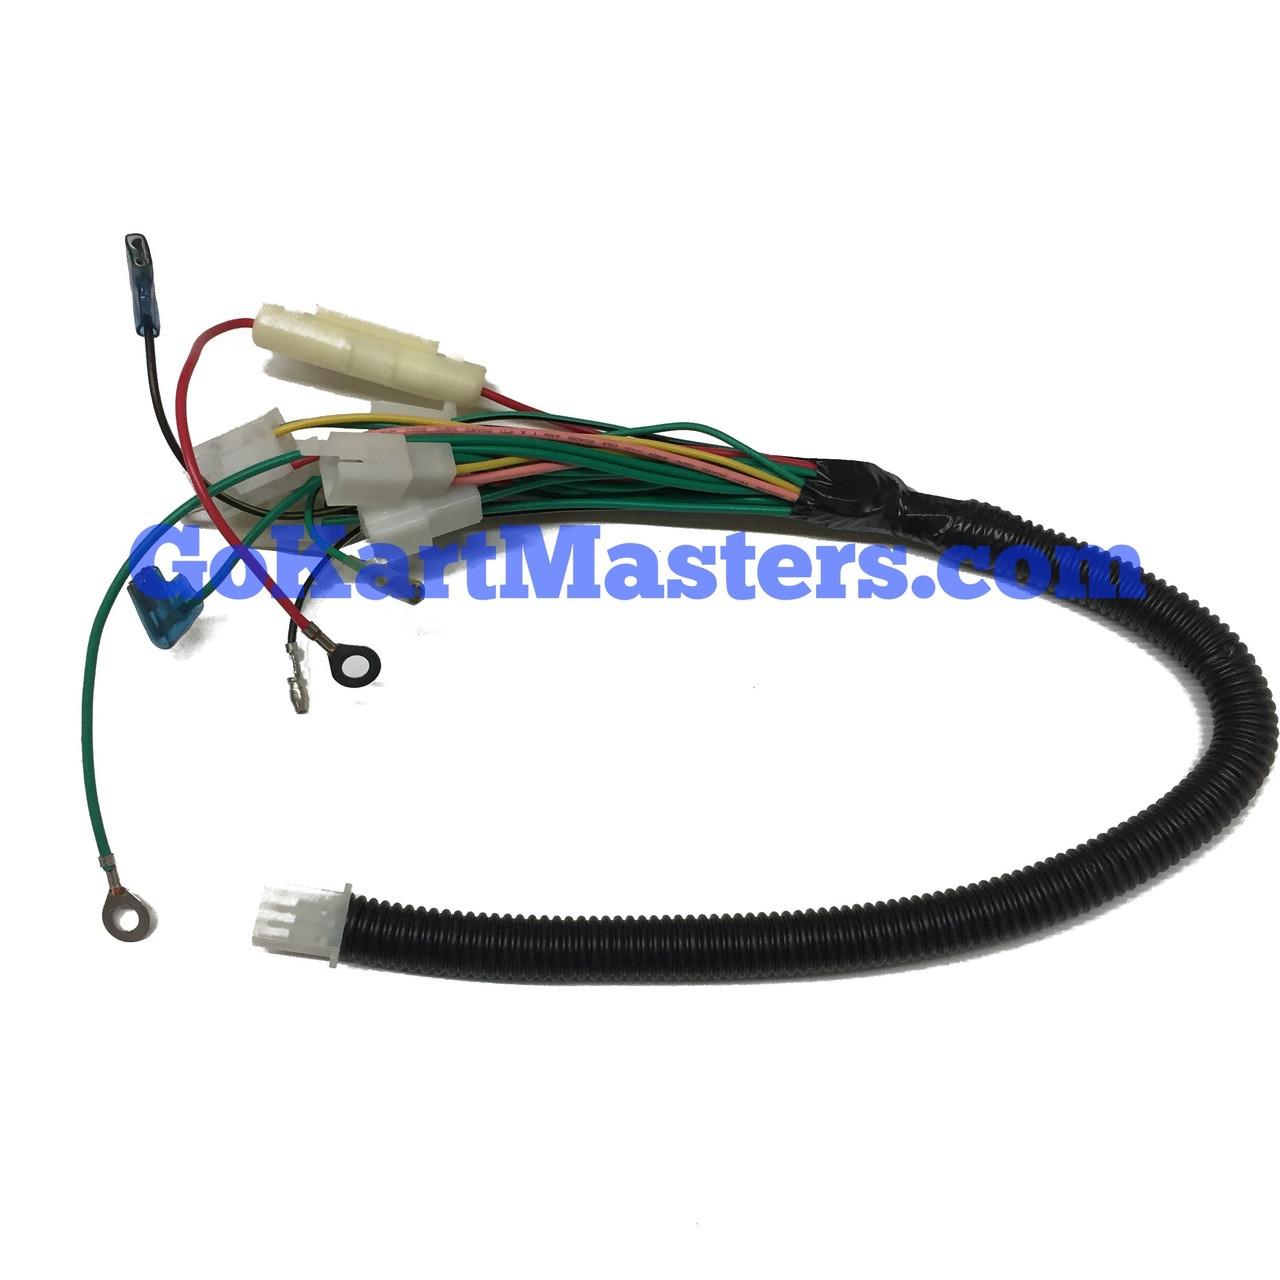 trailmaster 150 wiring diagram 1997 honda accord wiring